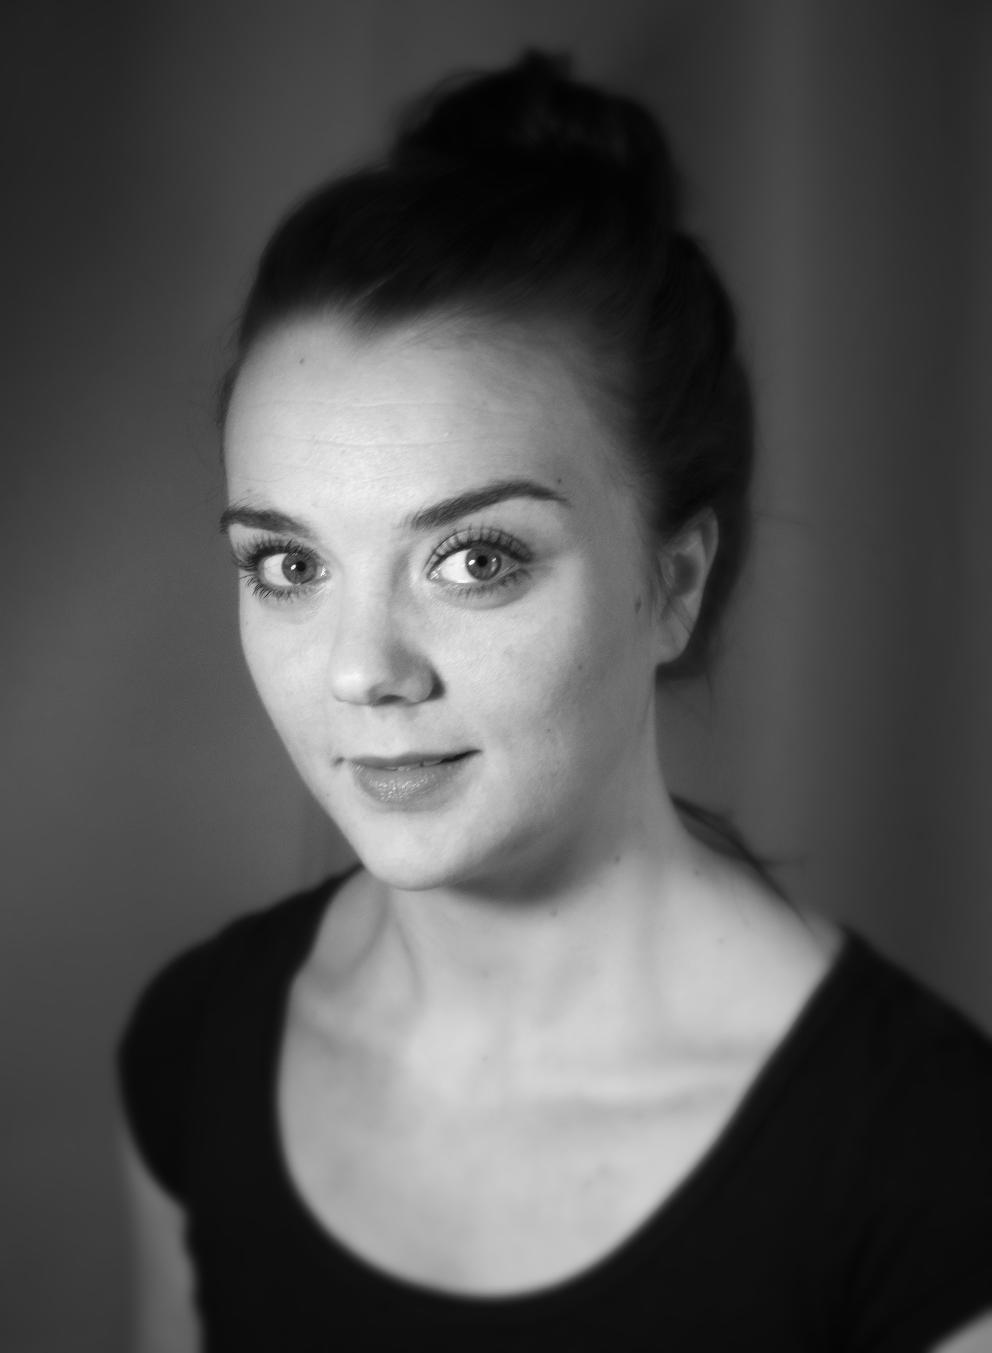 Anette Løbach